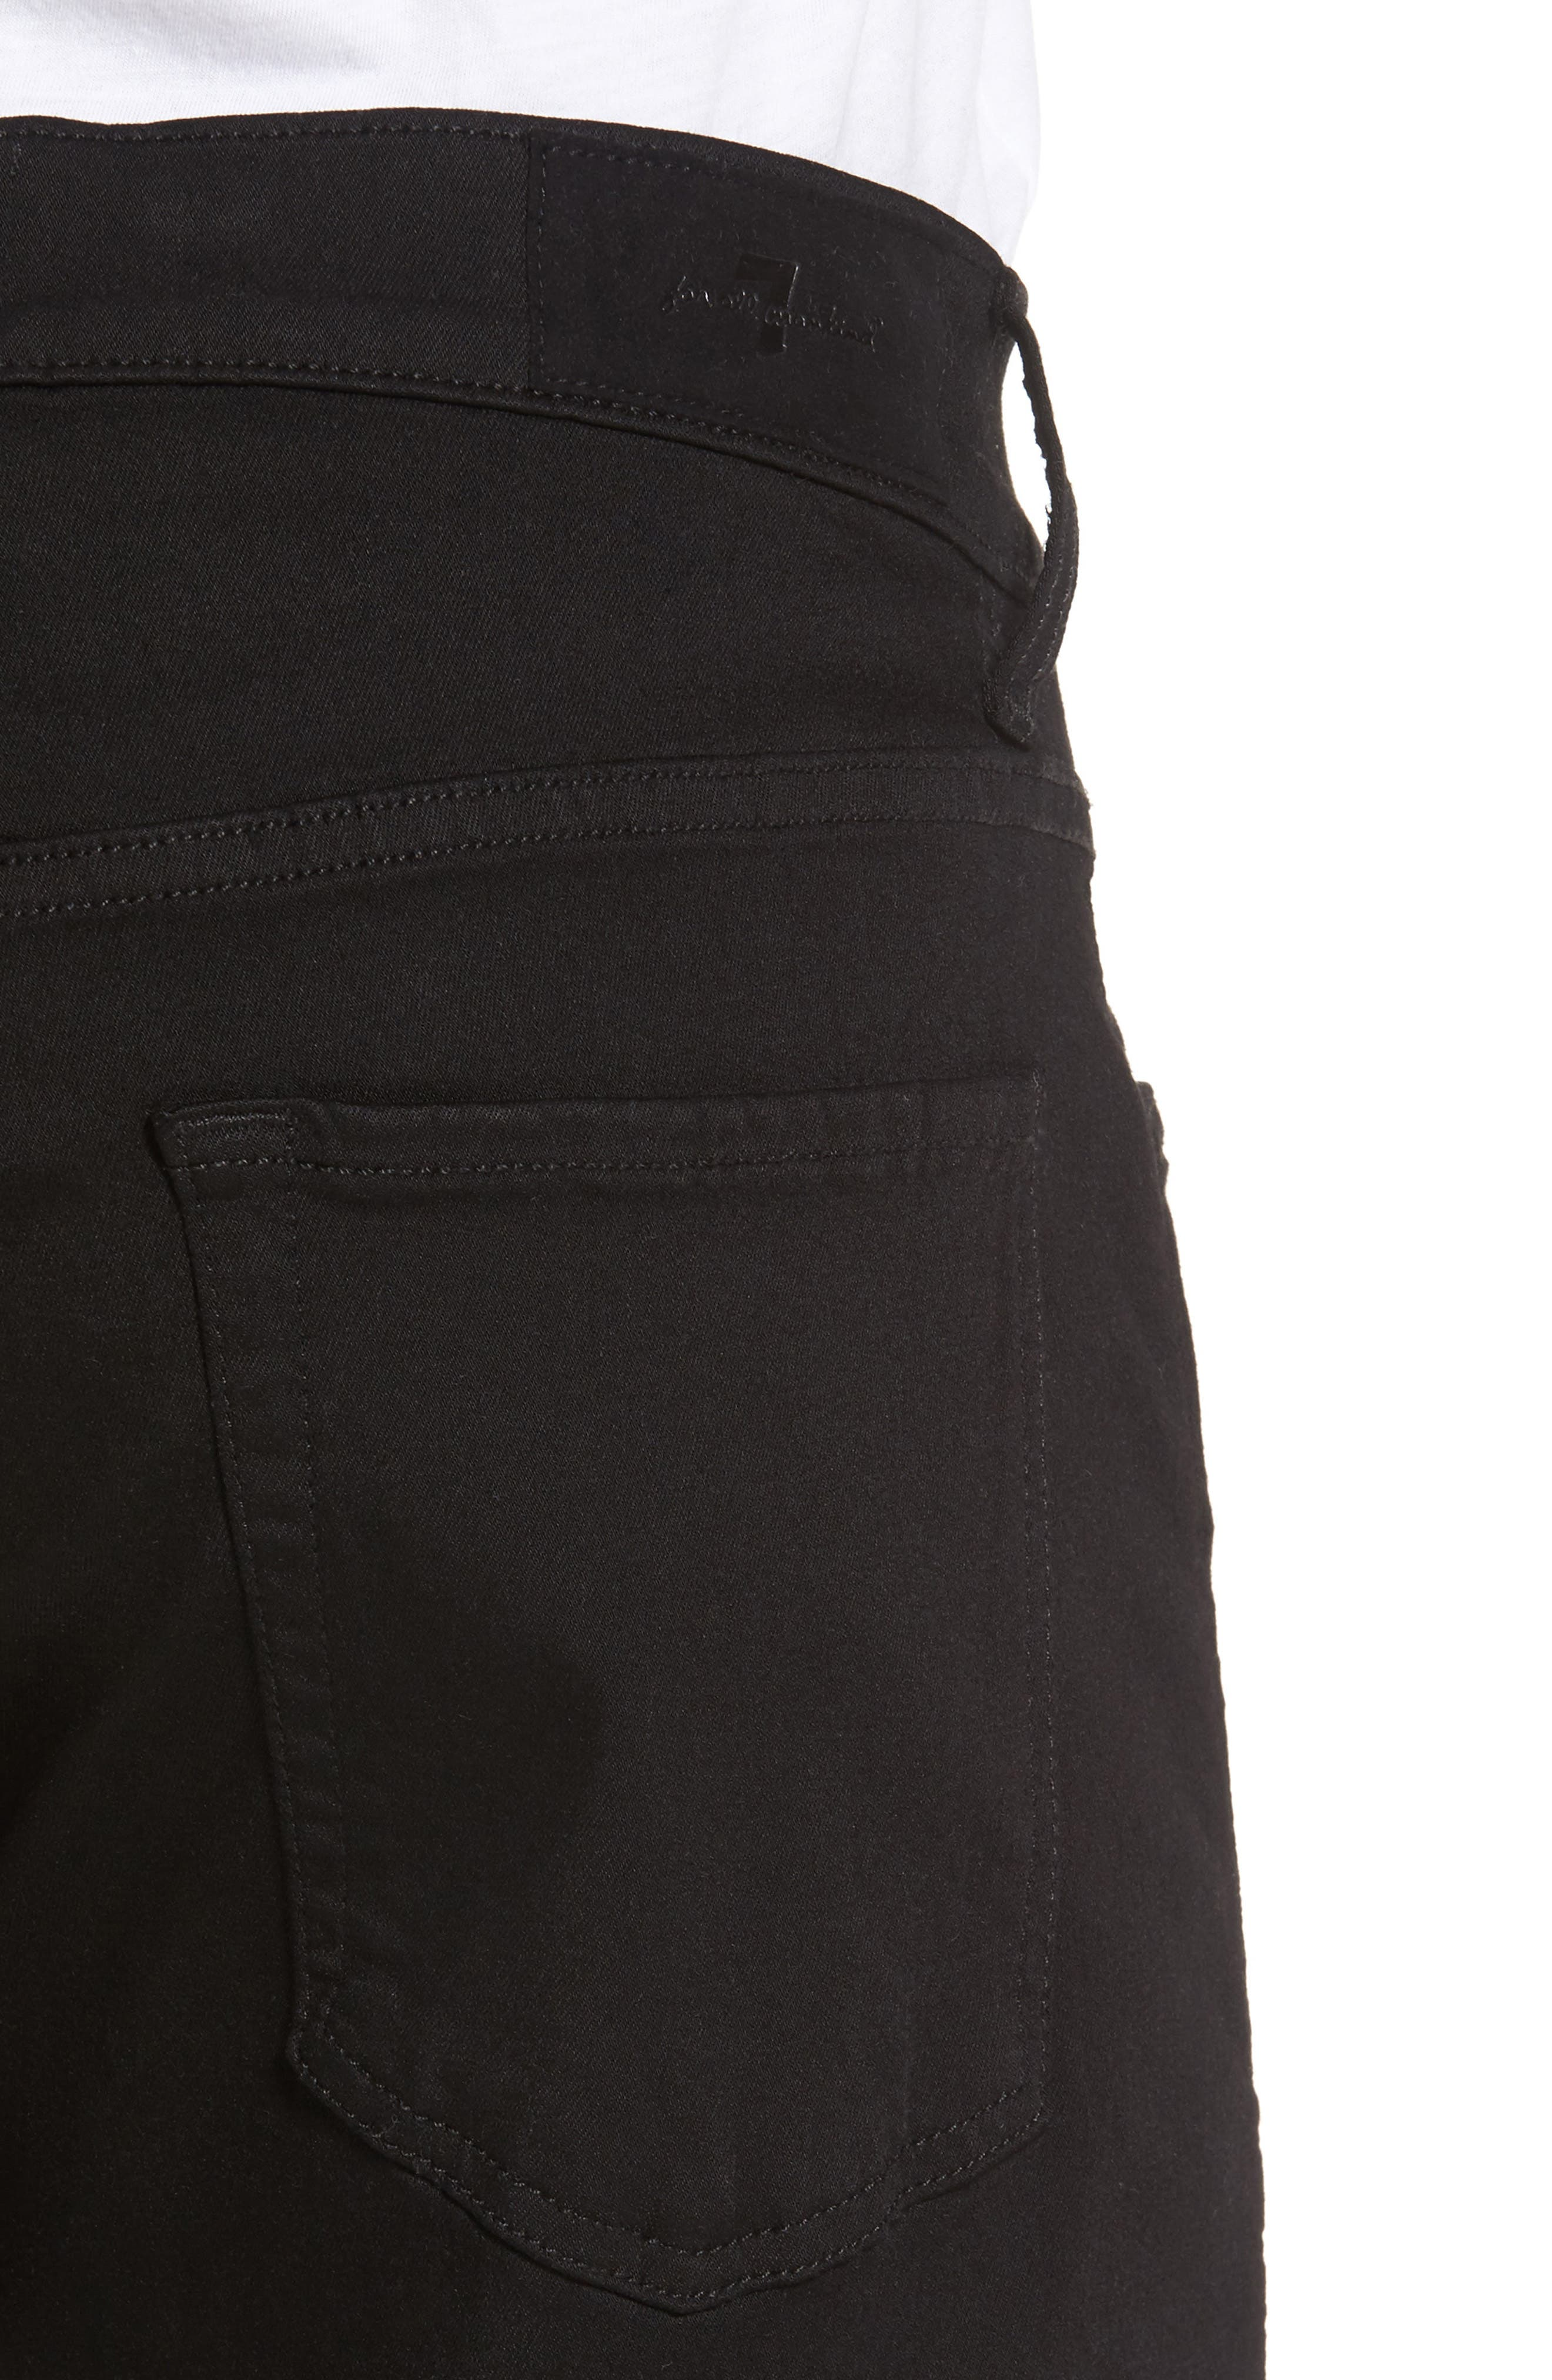 Slimmy Slim Leg Jeans,                             Alternate thumbnail 4, color,                             004